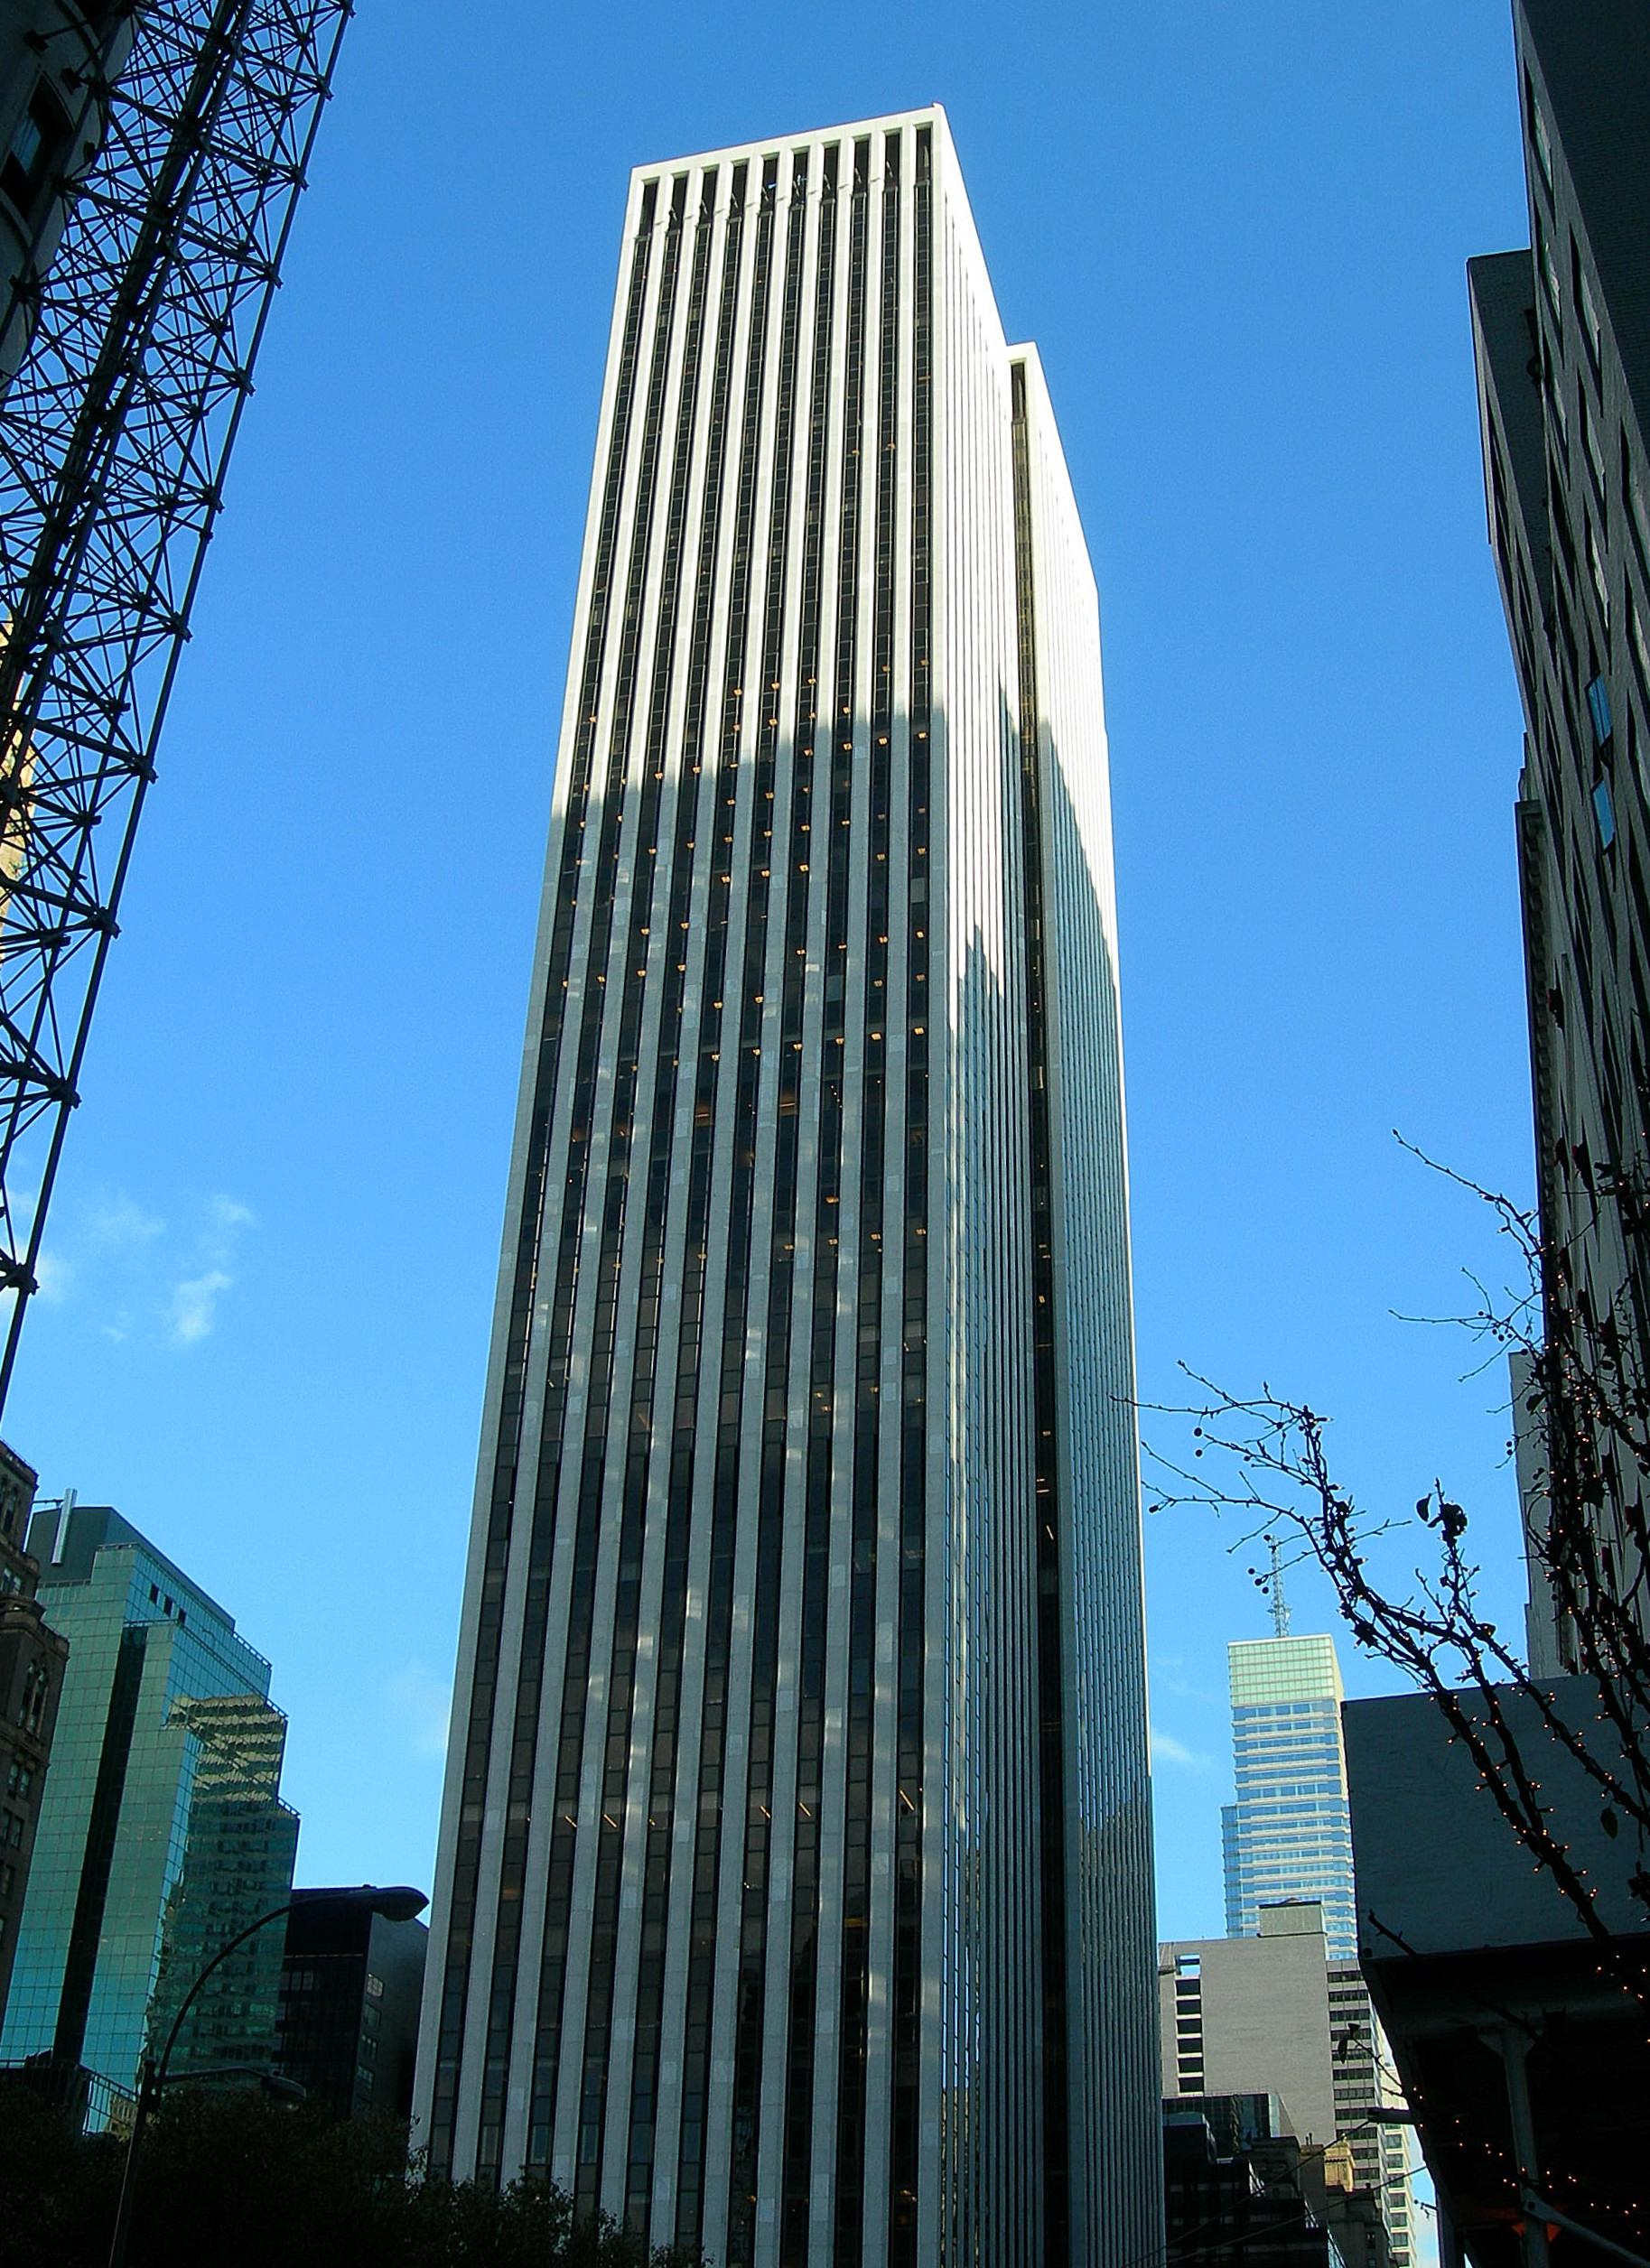 File:General Motors Building JPG - Wikimedia Commons